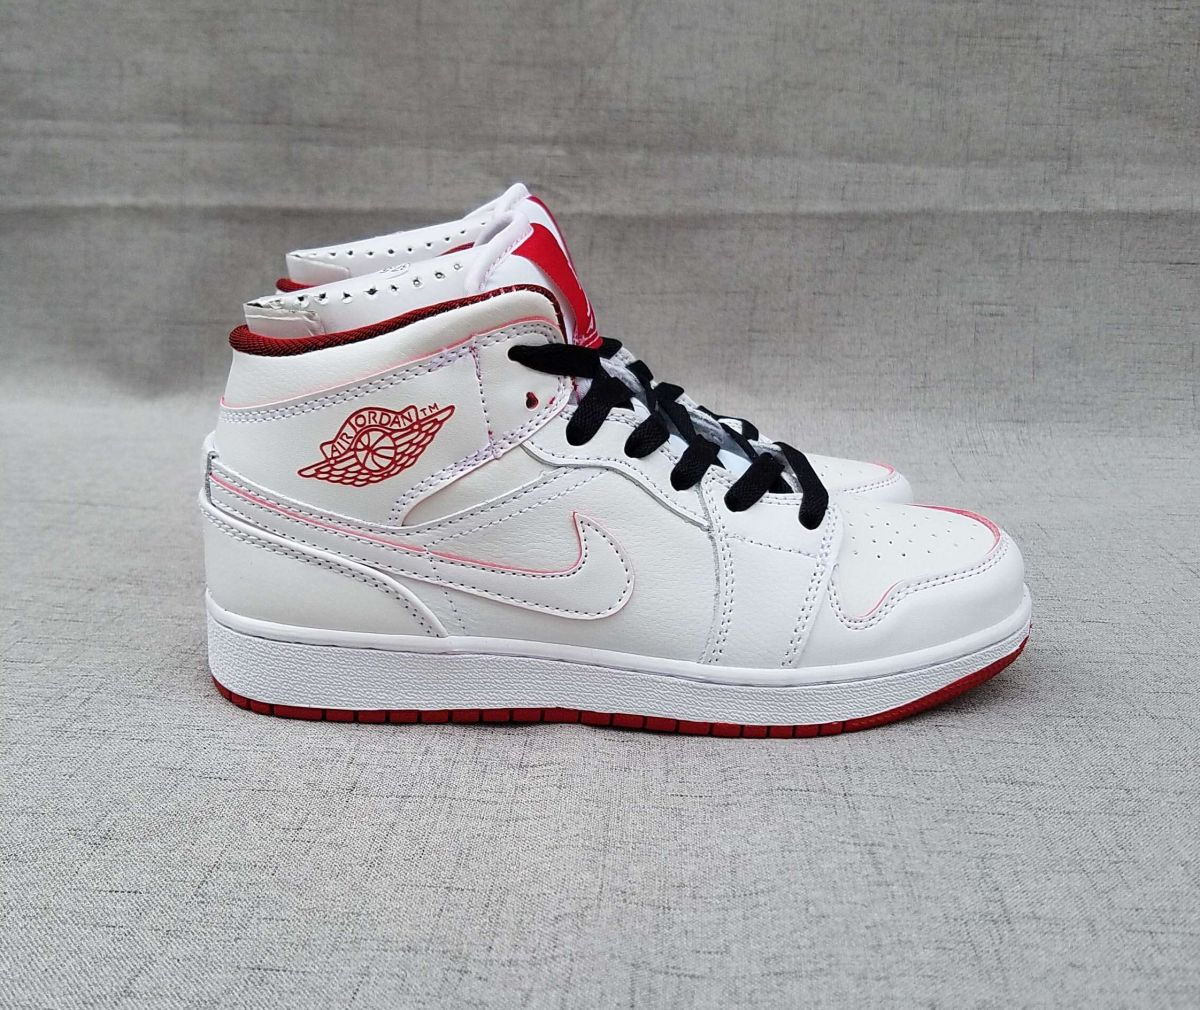 3e10521d880 Tênis Nike Air Jordan 1 Retro High Feminino na Import Clothes